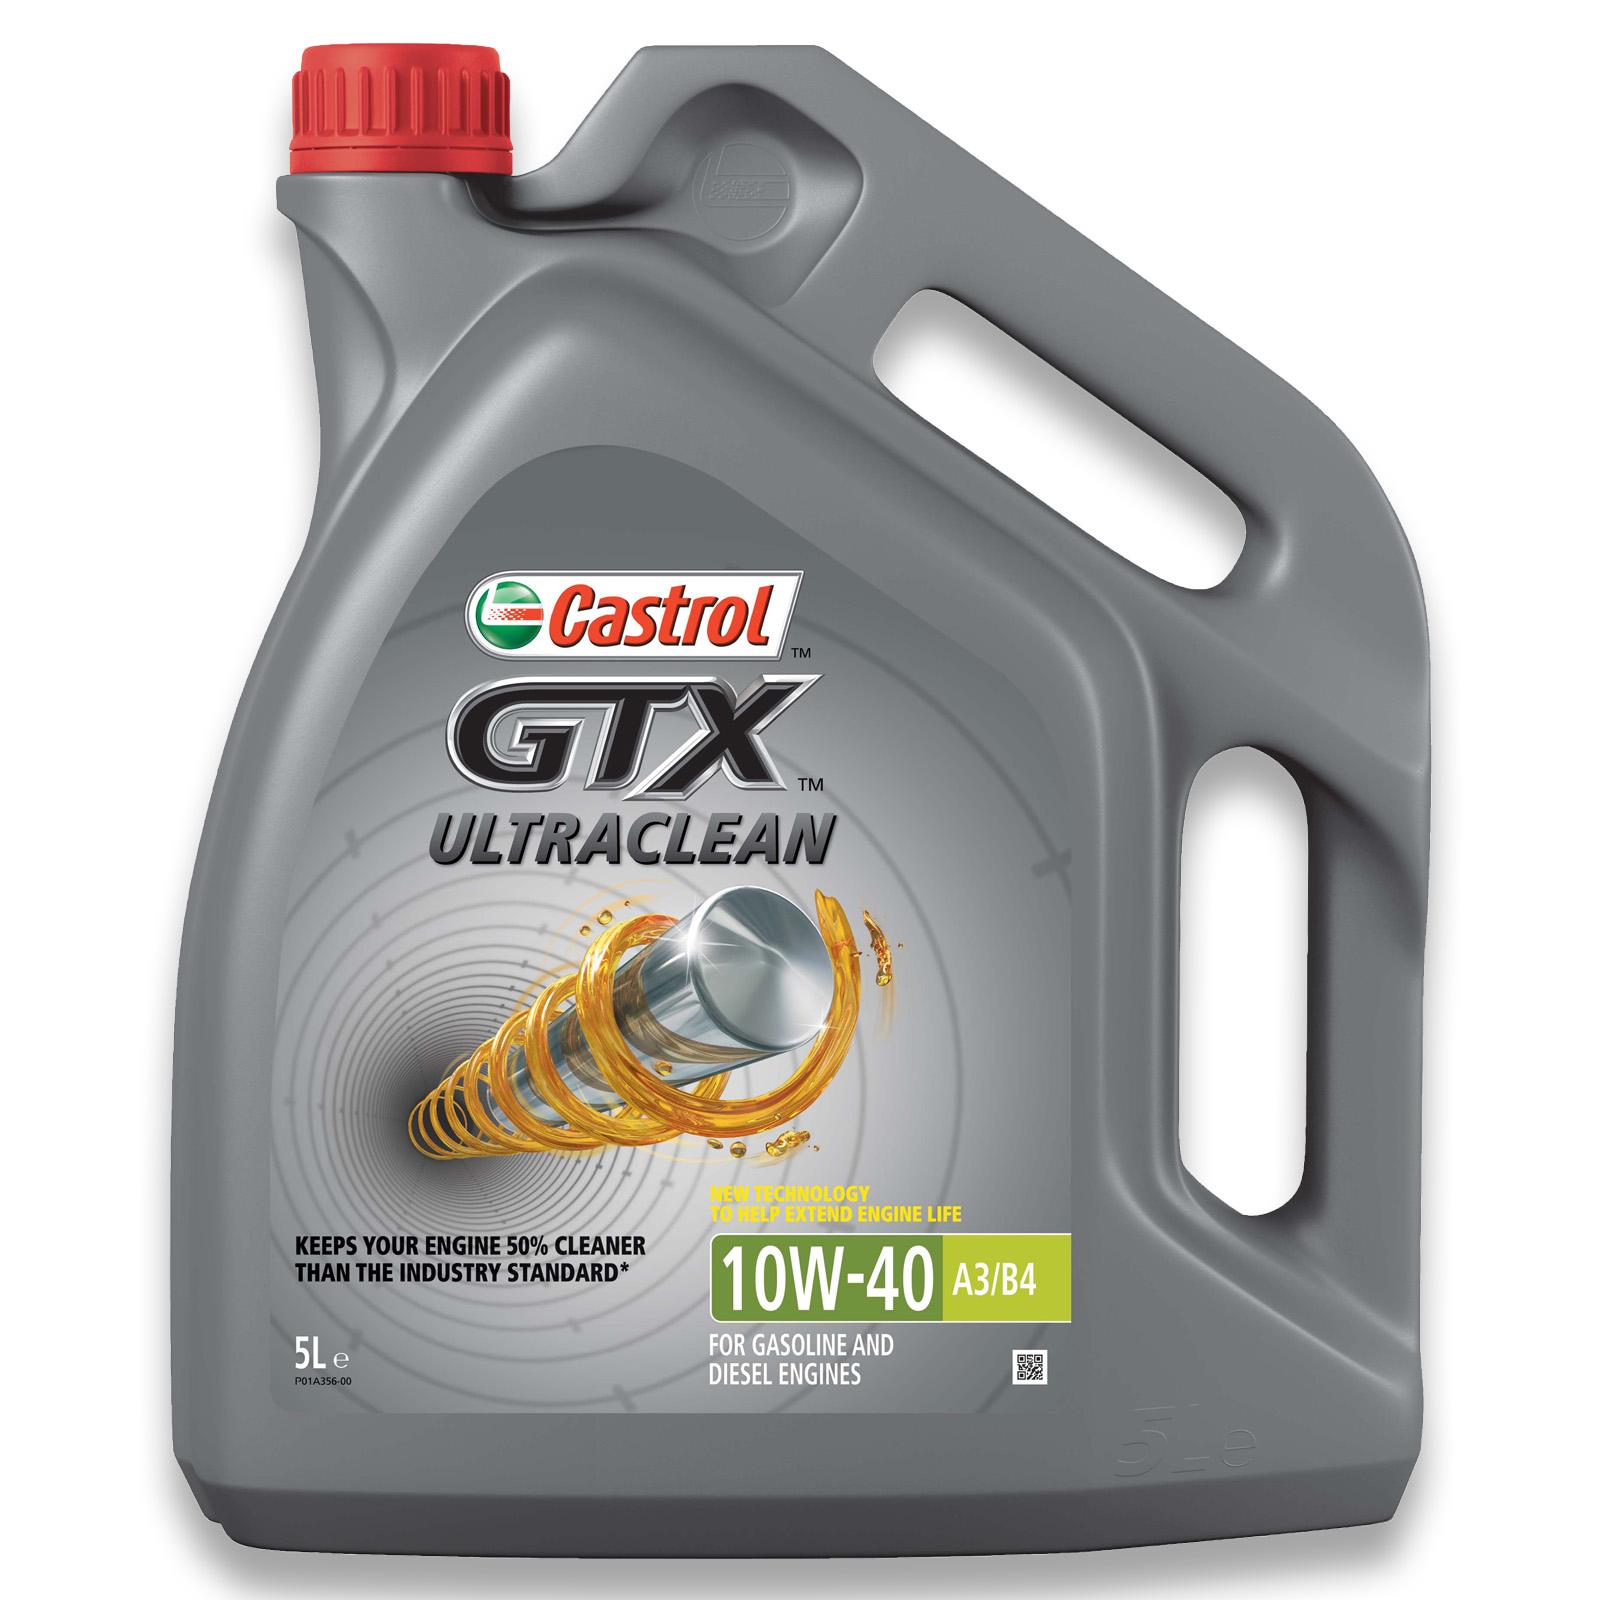 5L CASTROL GTX ULTRACLEAN 10W-40